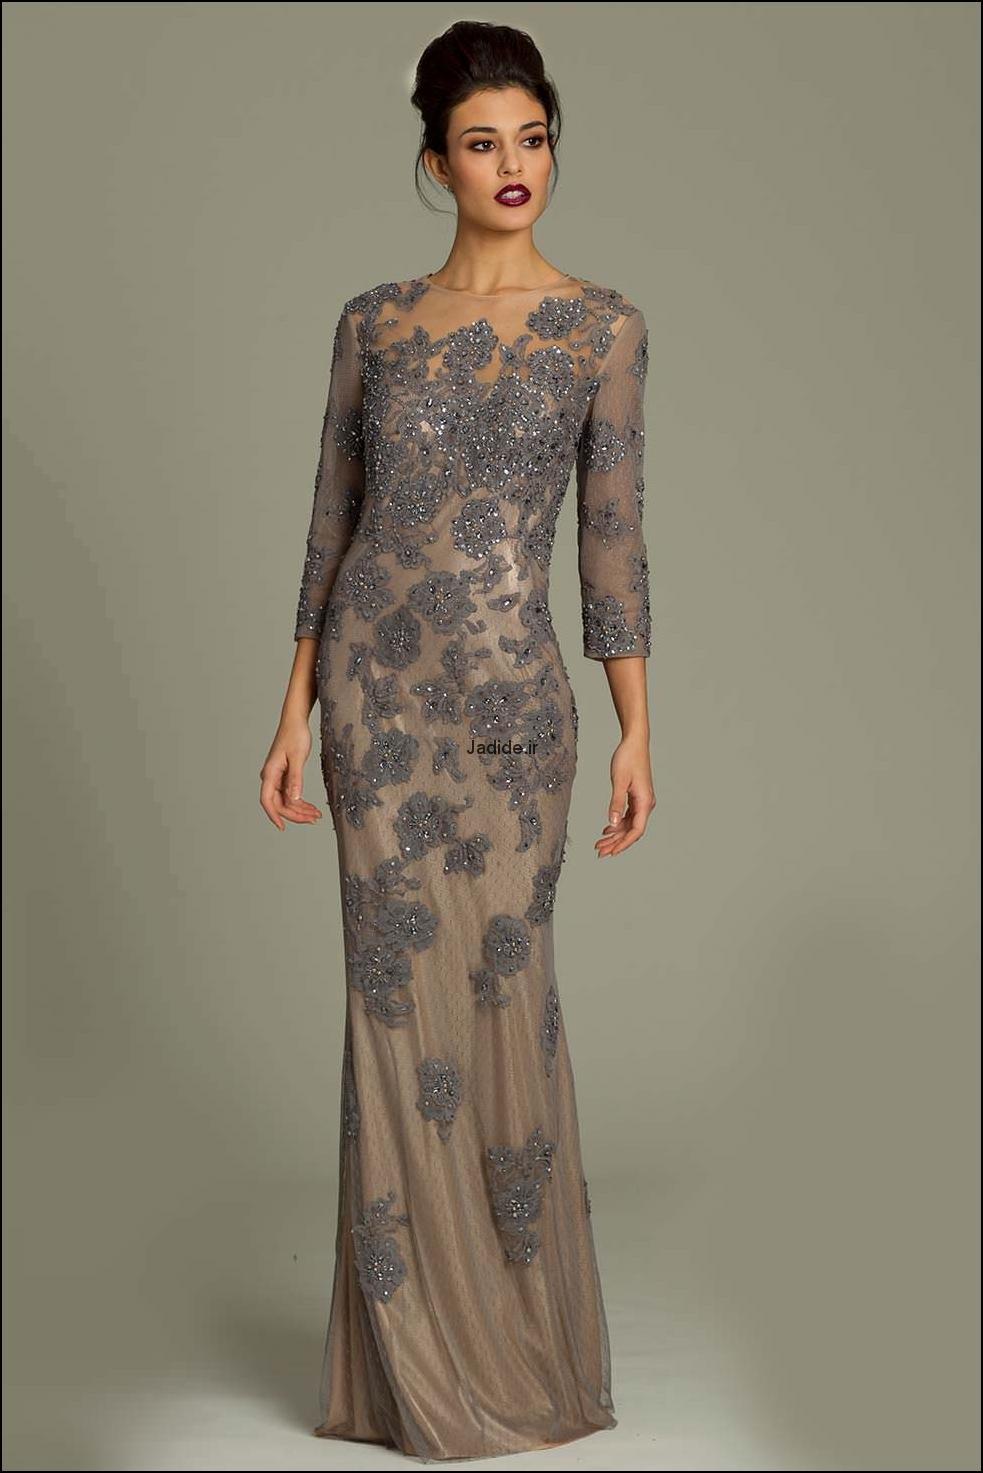 لباس مجلسی گیپور (6)